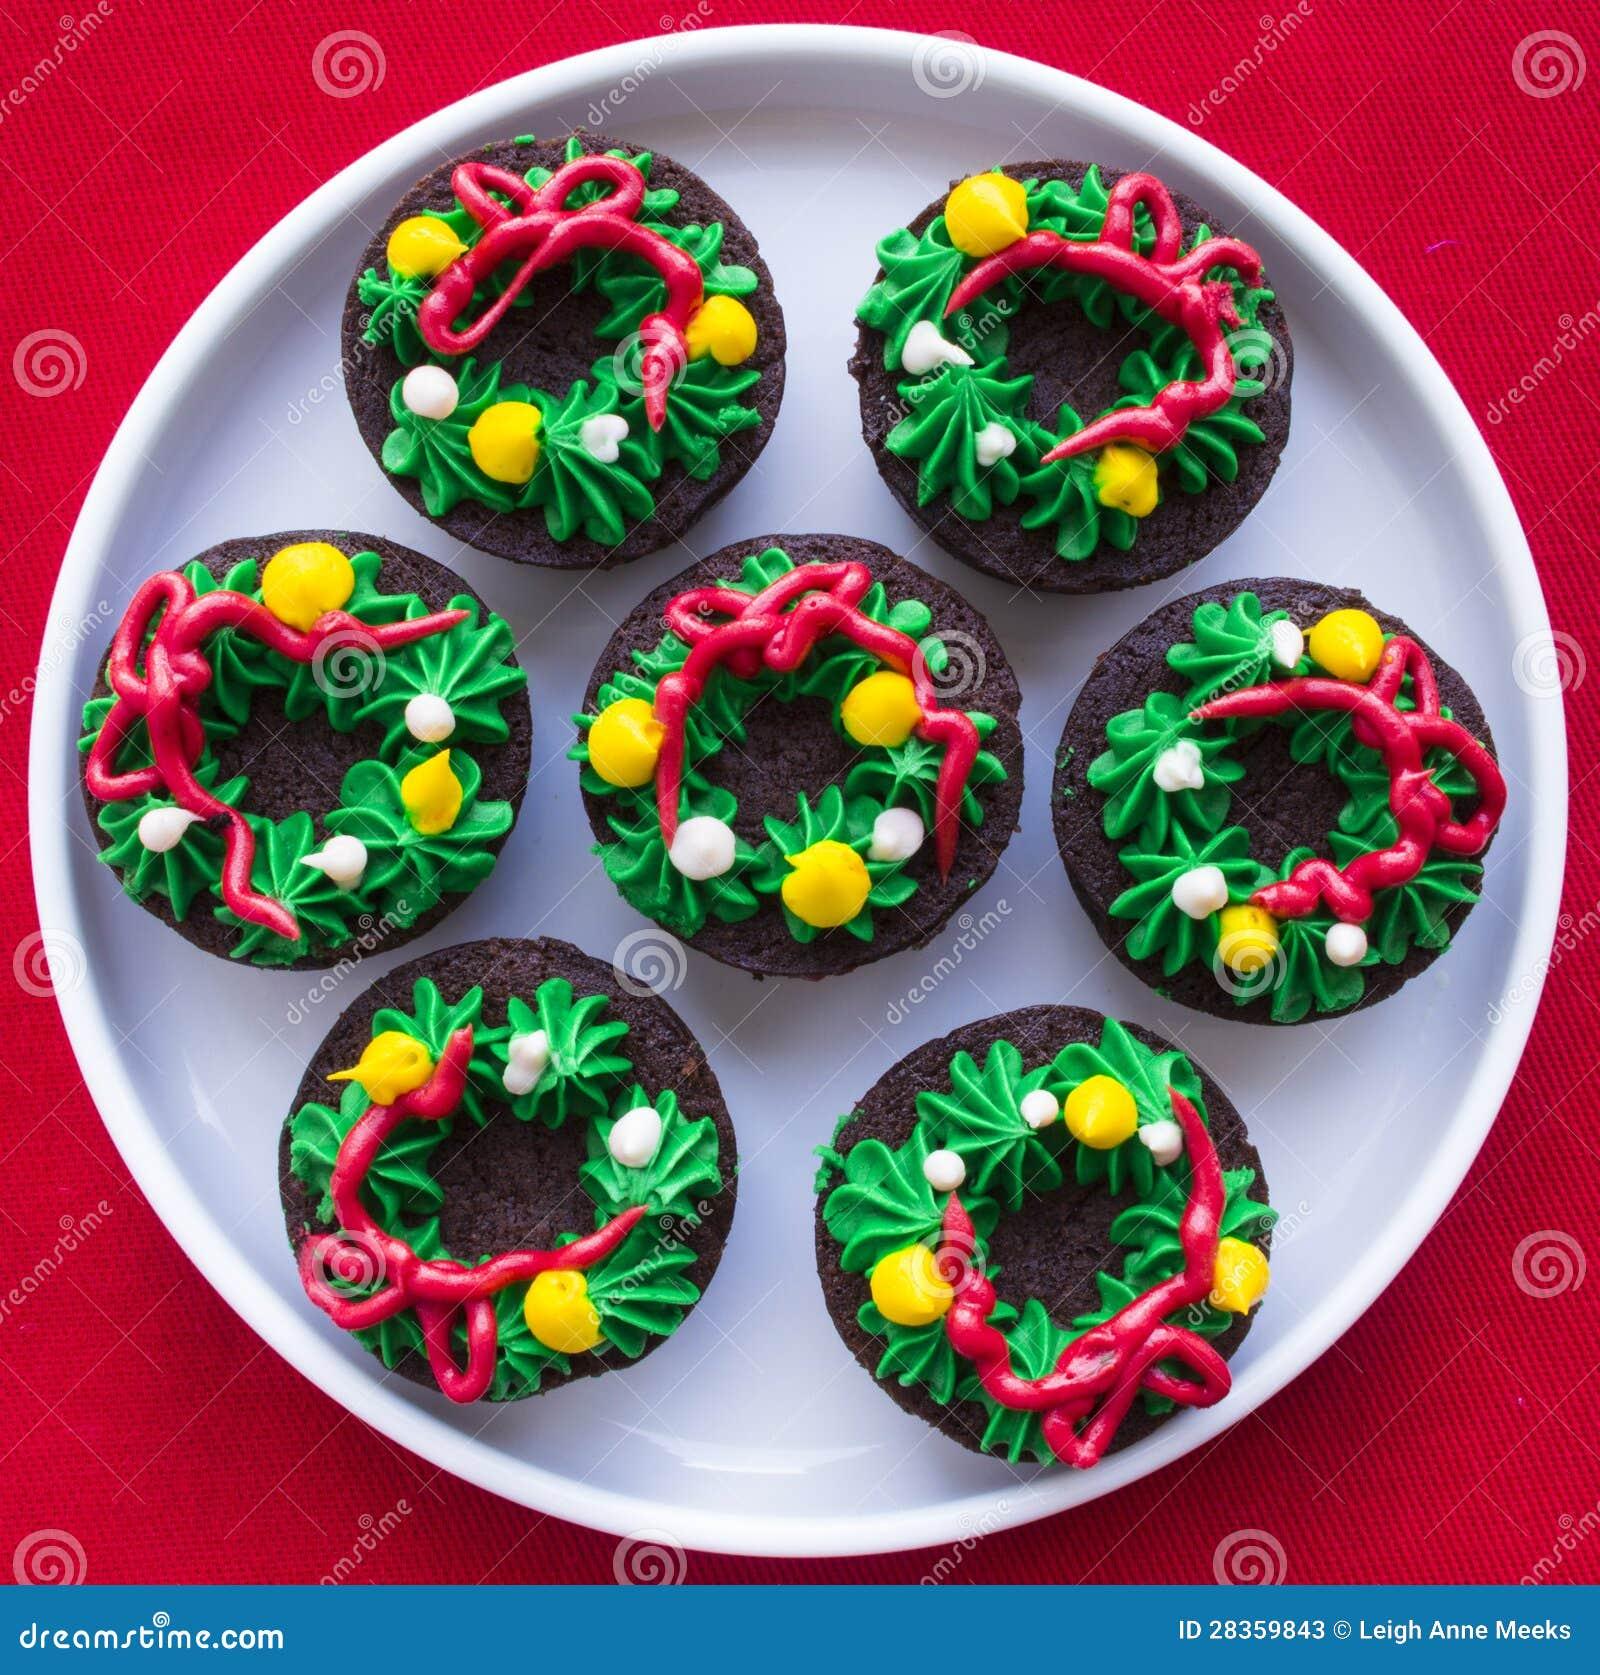 Christmas Wreath Brownies Stock Image. Image Of